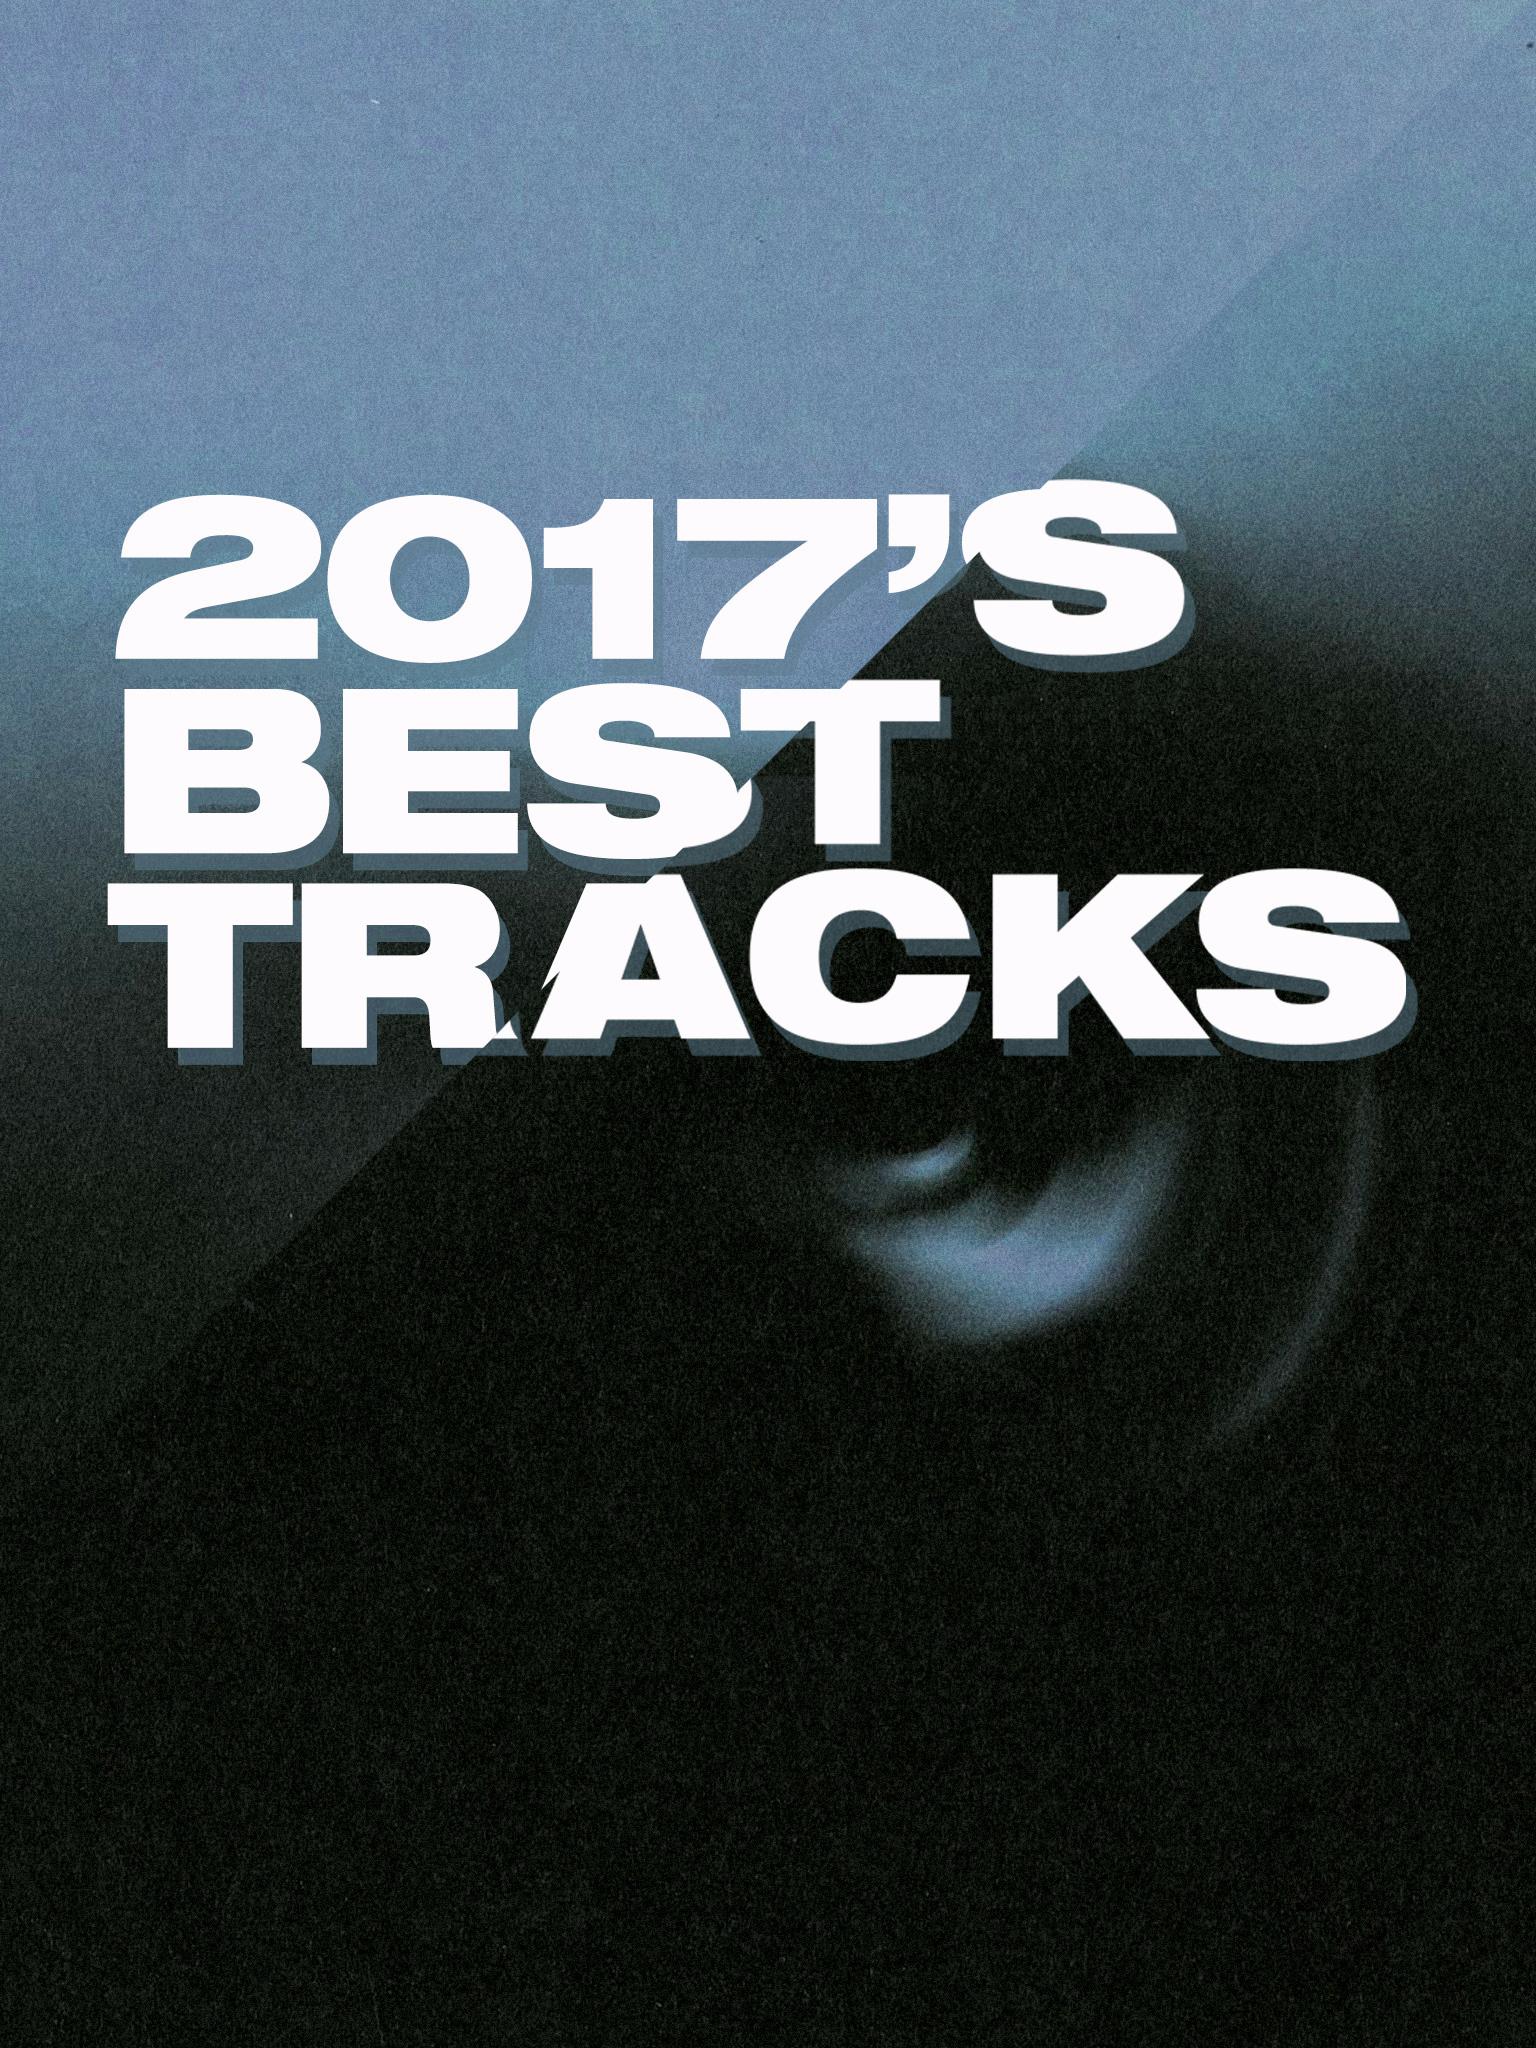 RA: 2017's Best Tracks